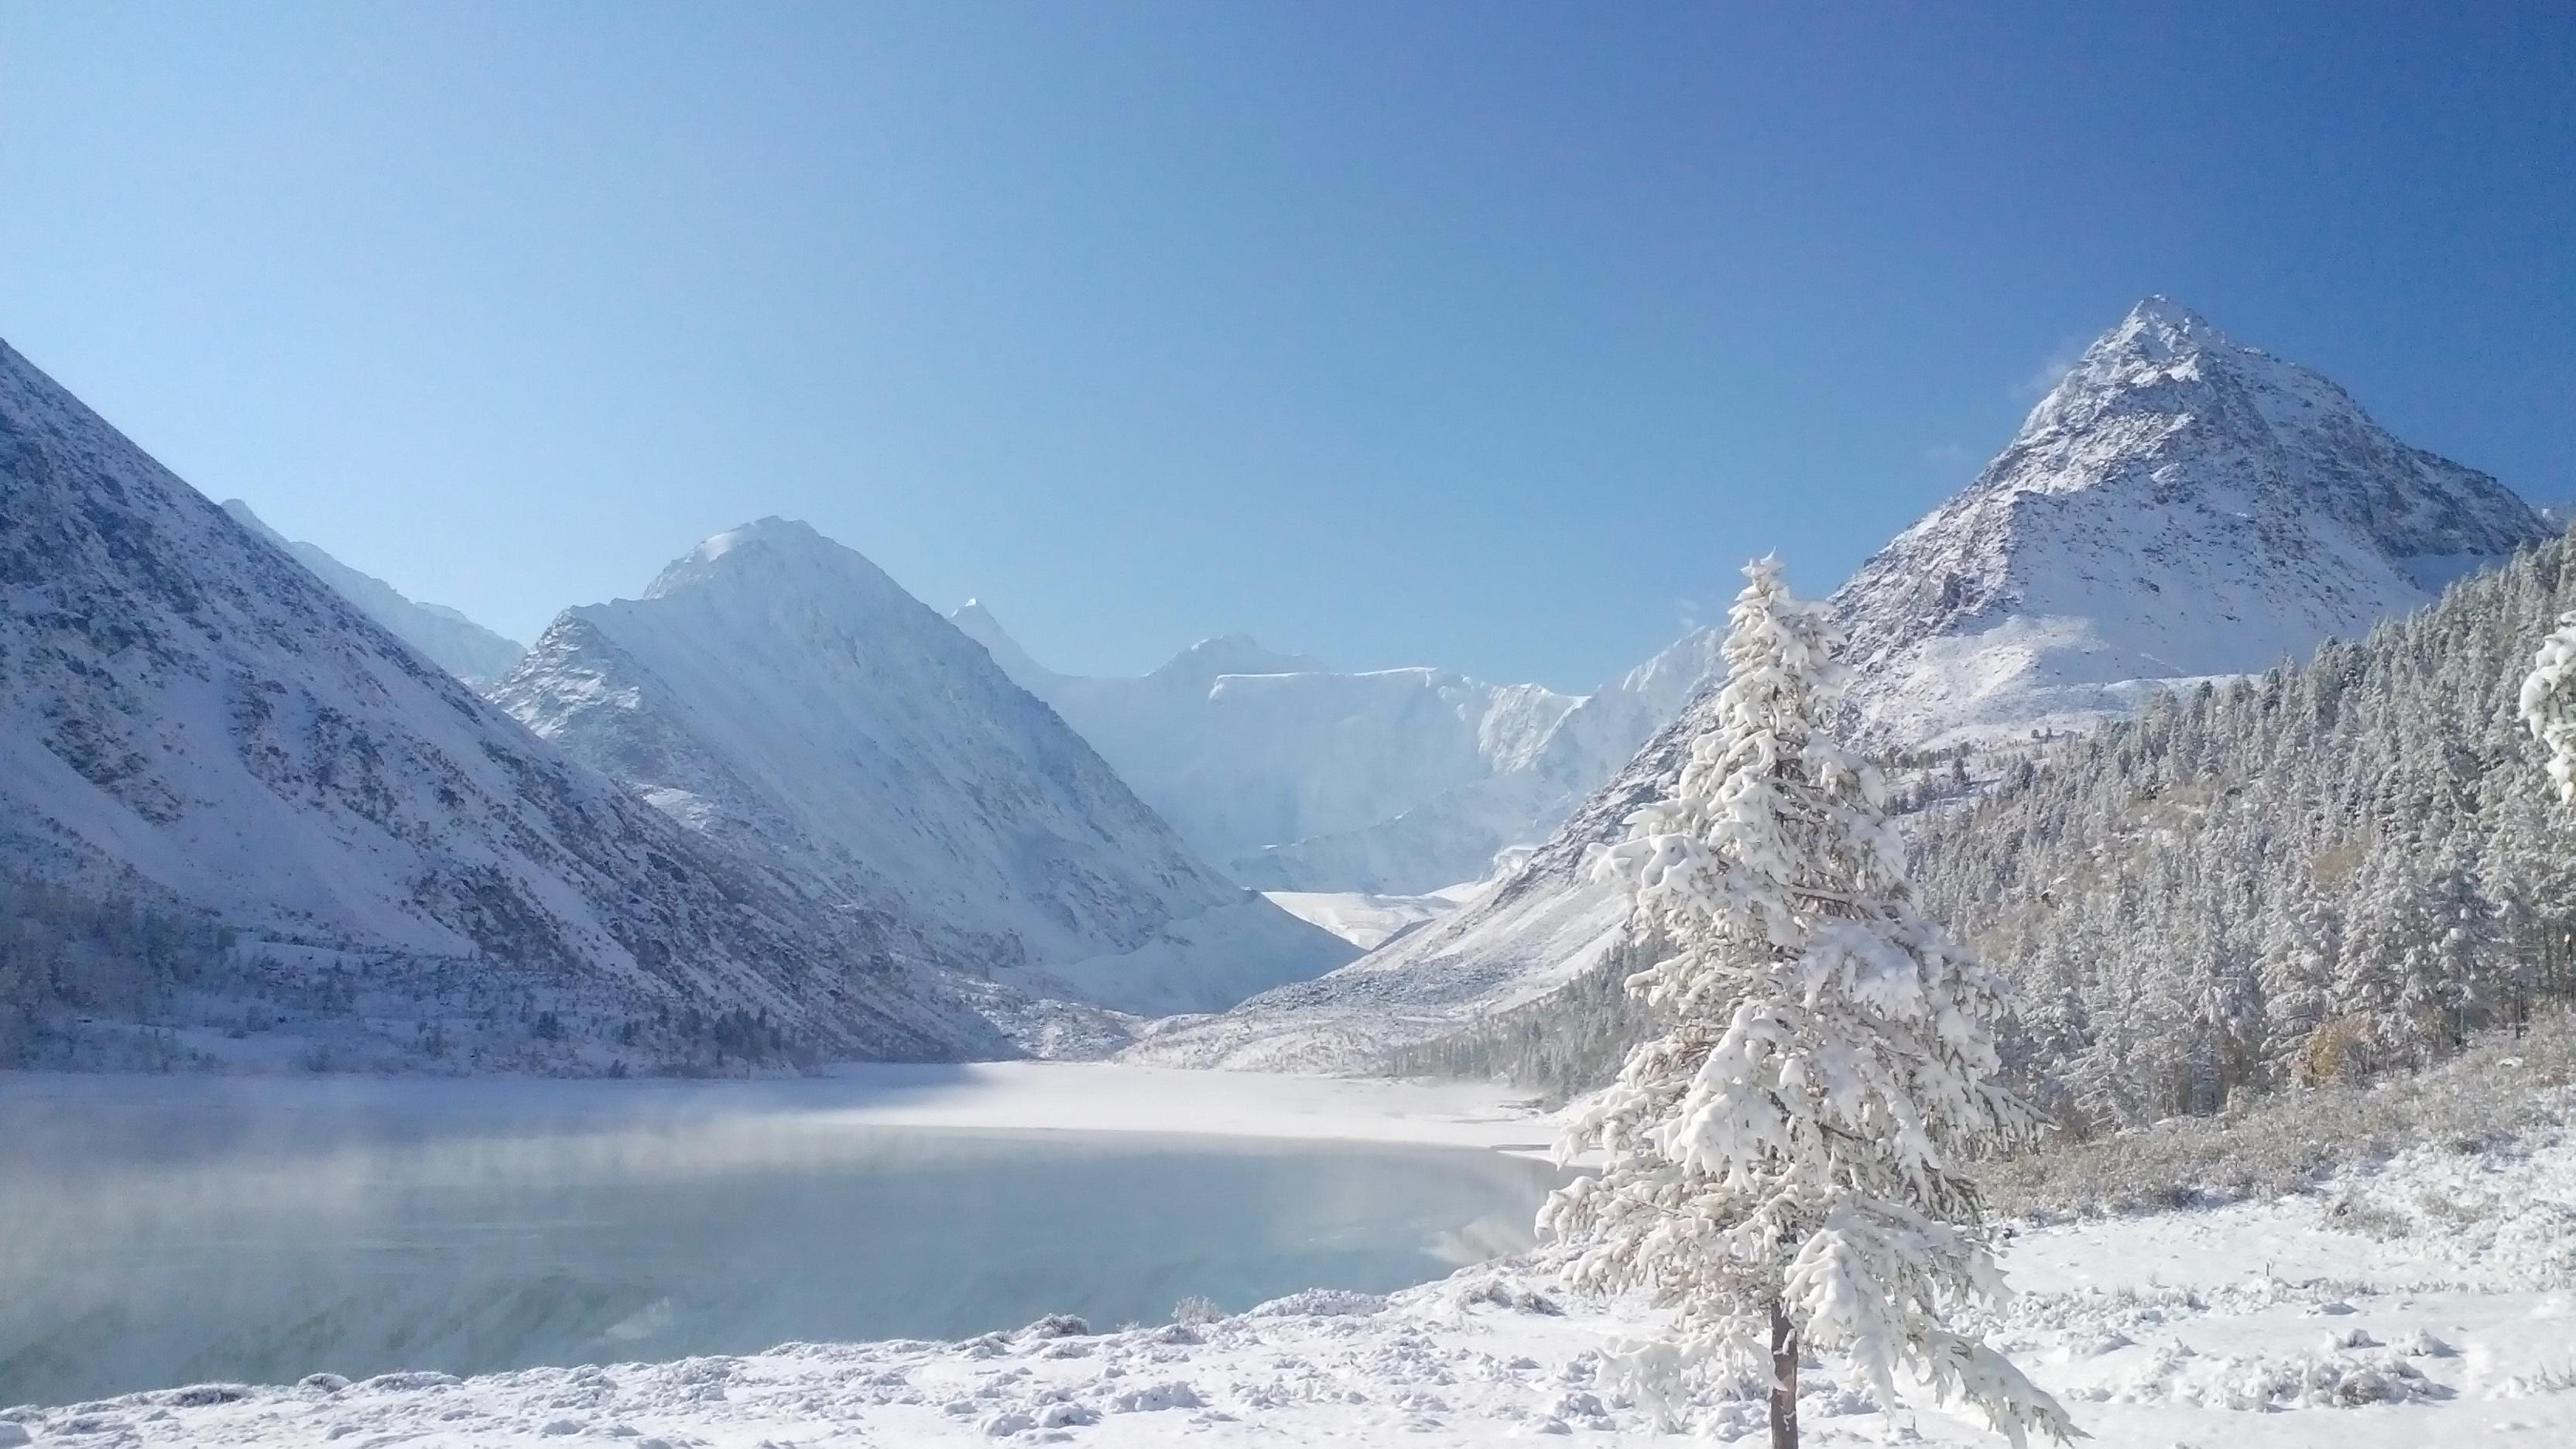 23 1 - 10 locais no Altay que vale a pena visitar